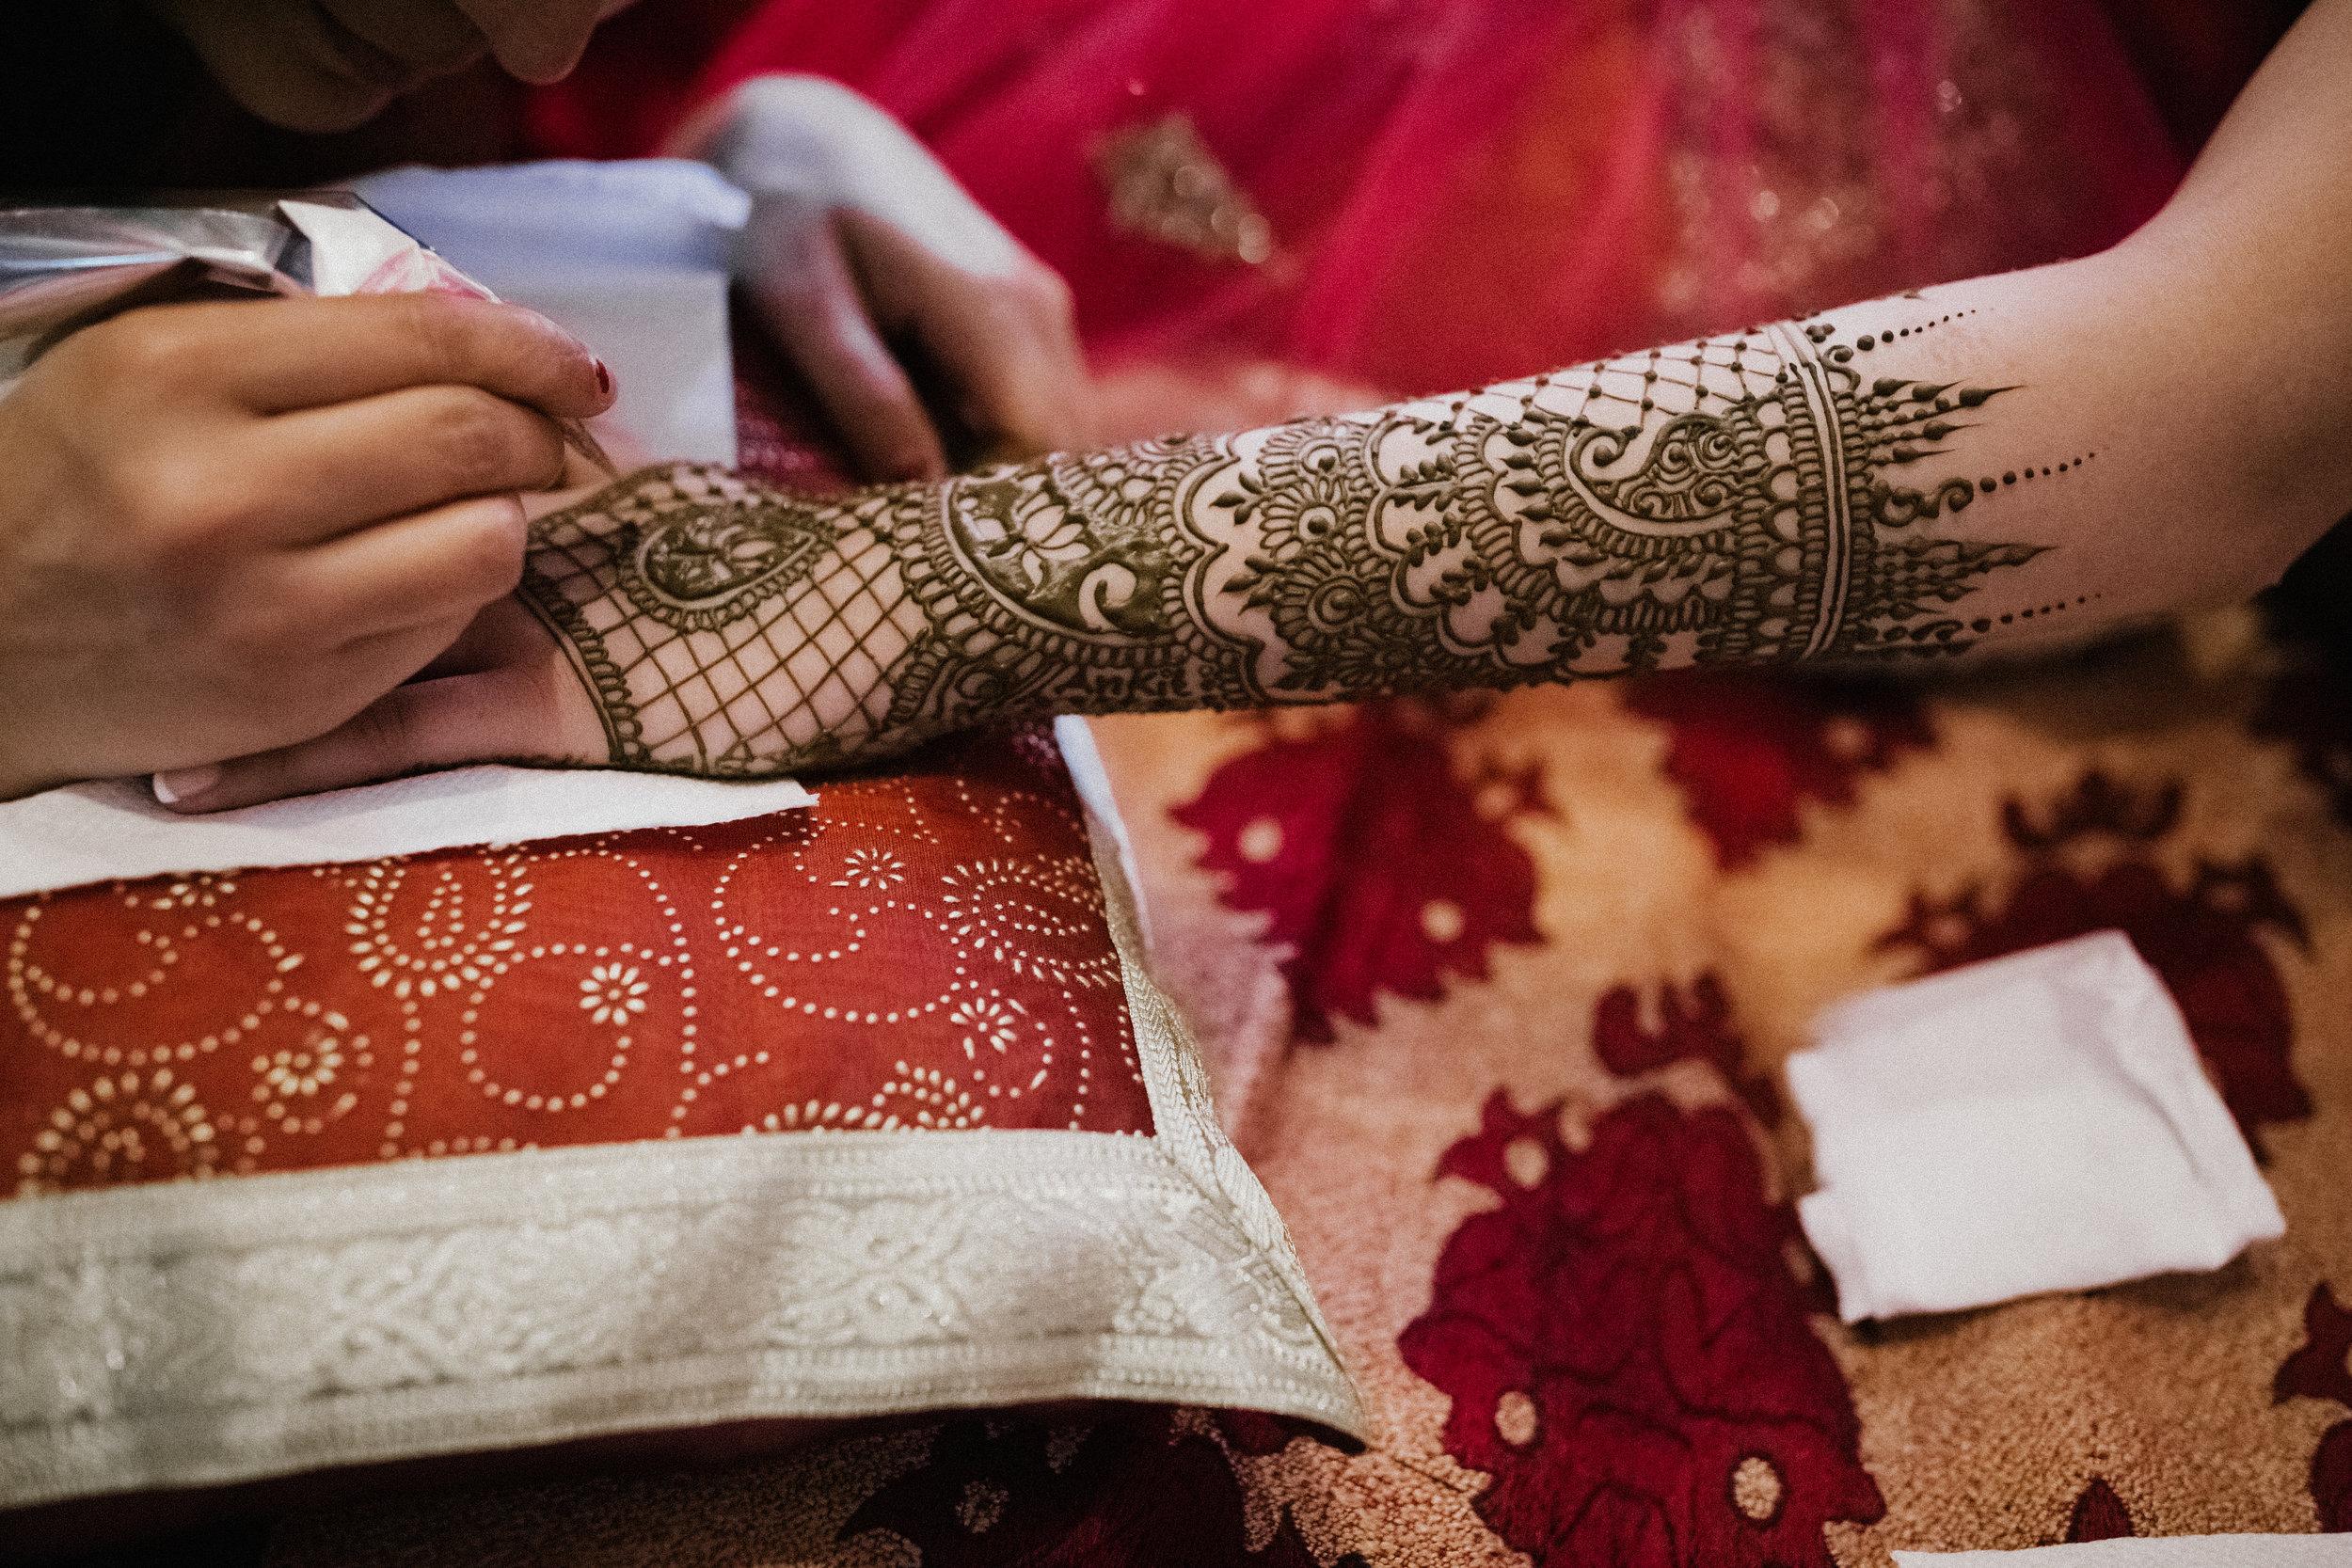 Aparna-Ankit-Patel-Mehndi-Wedding-Photos-0049.jpg